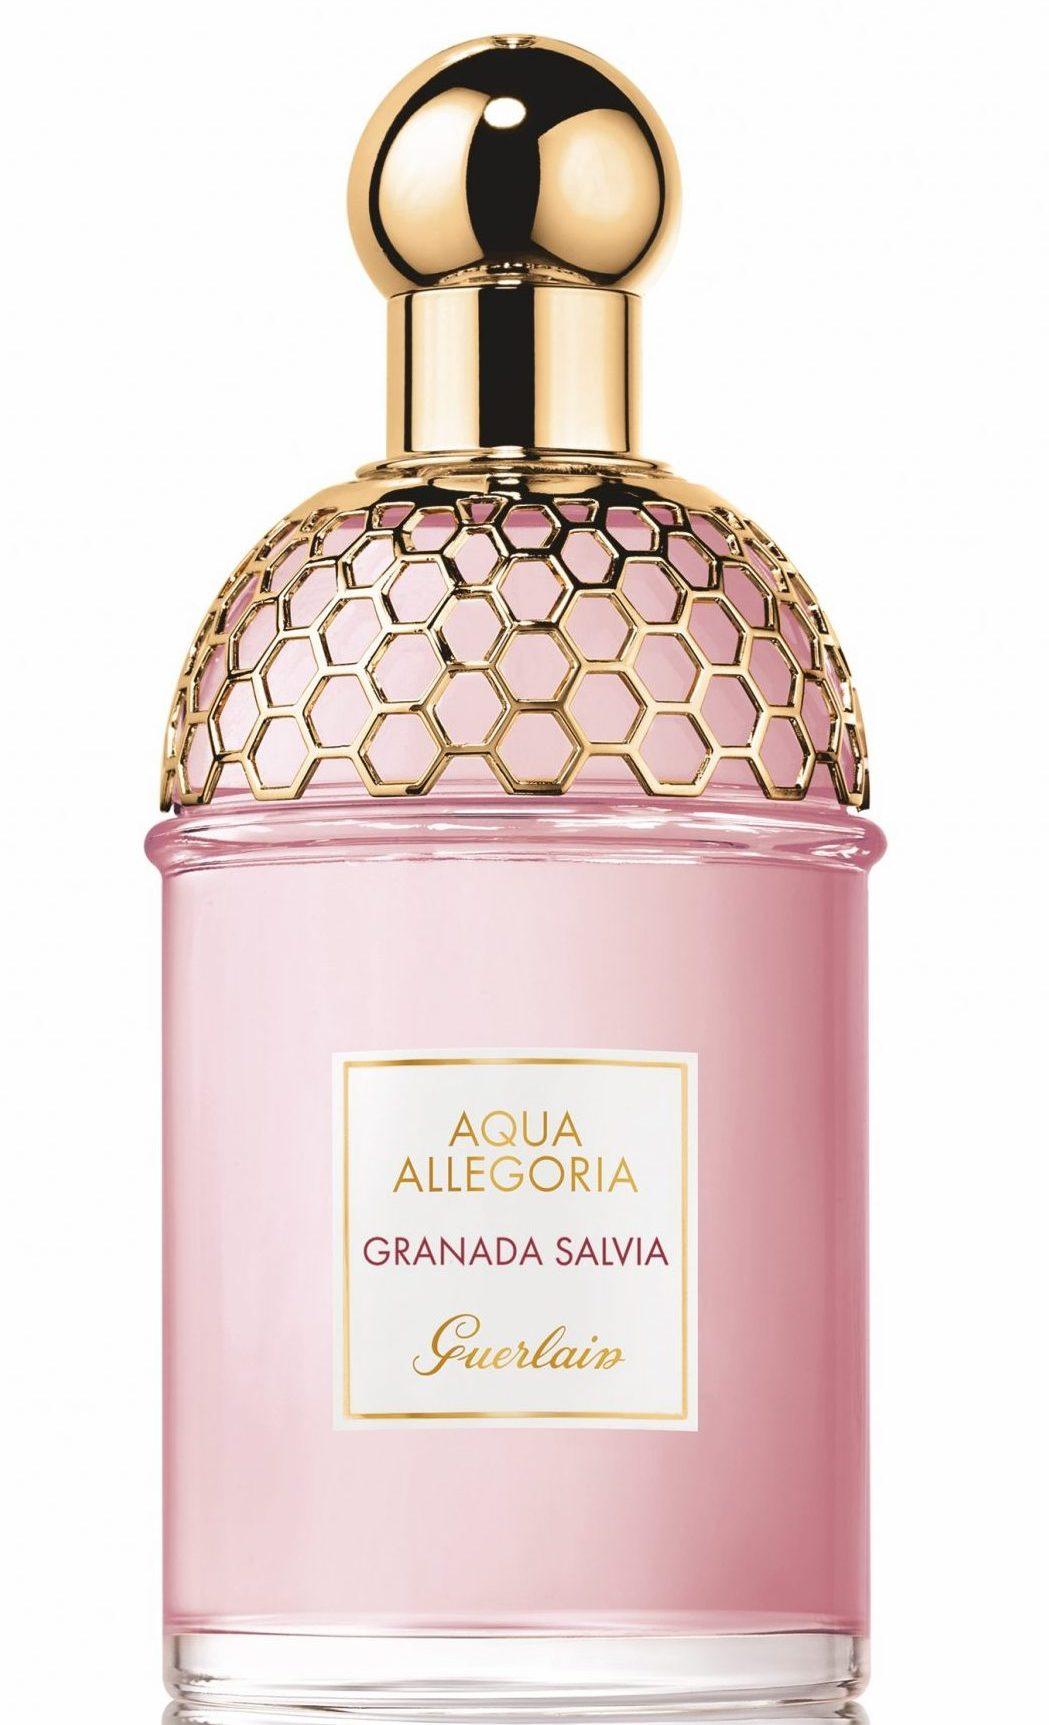 GUERLAIN_ACQUA_ALLEGORIA_GRAN_SALVIA